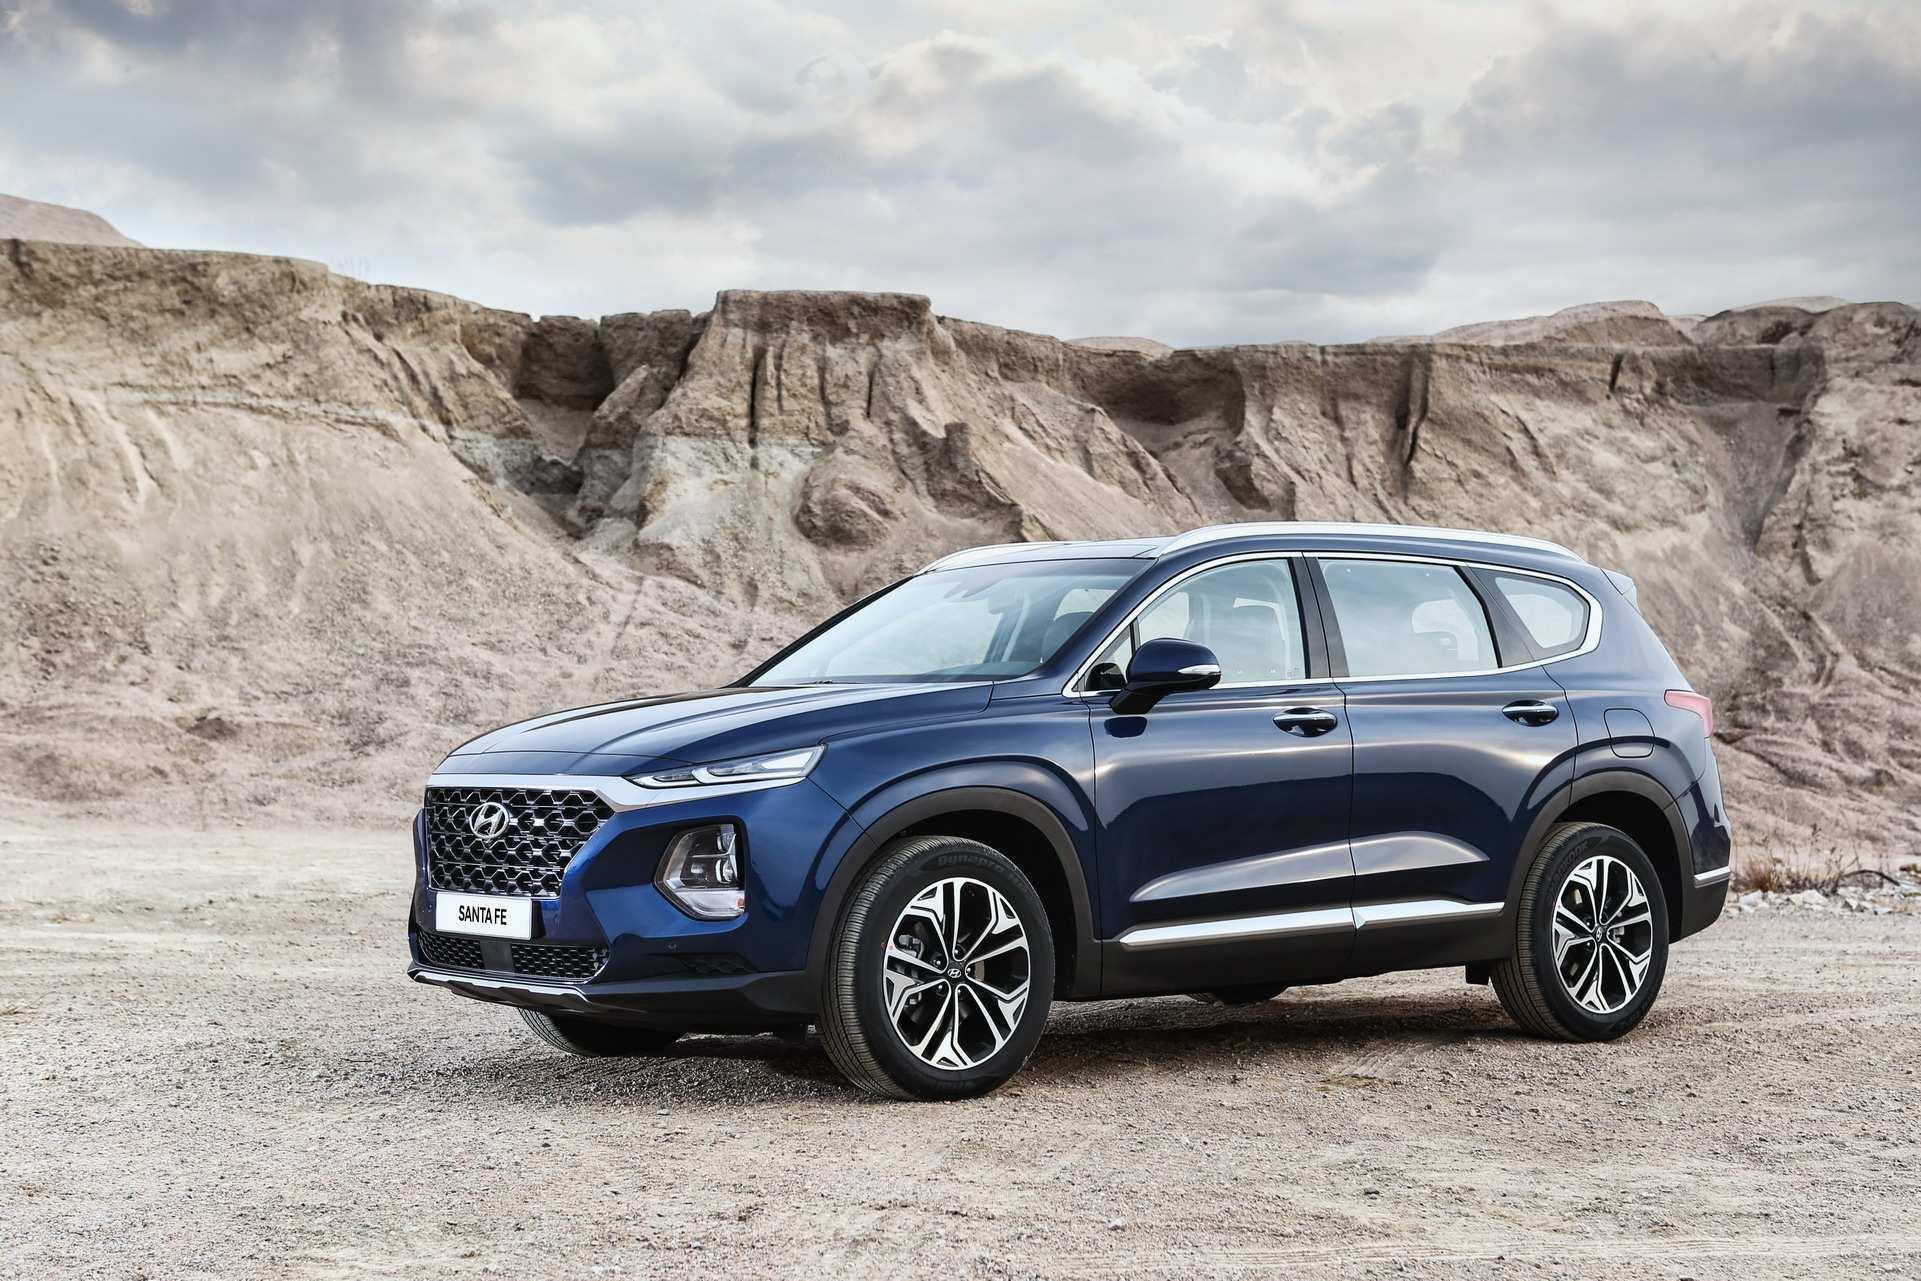 26 Concept of 2019 Hyundai Santa Fe Launch Reviews by 2019 Hyundai Santa Fe Launch